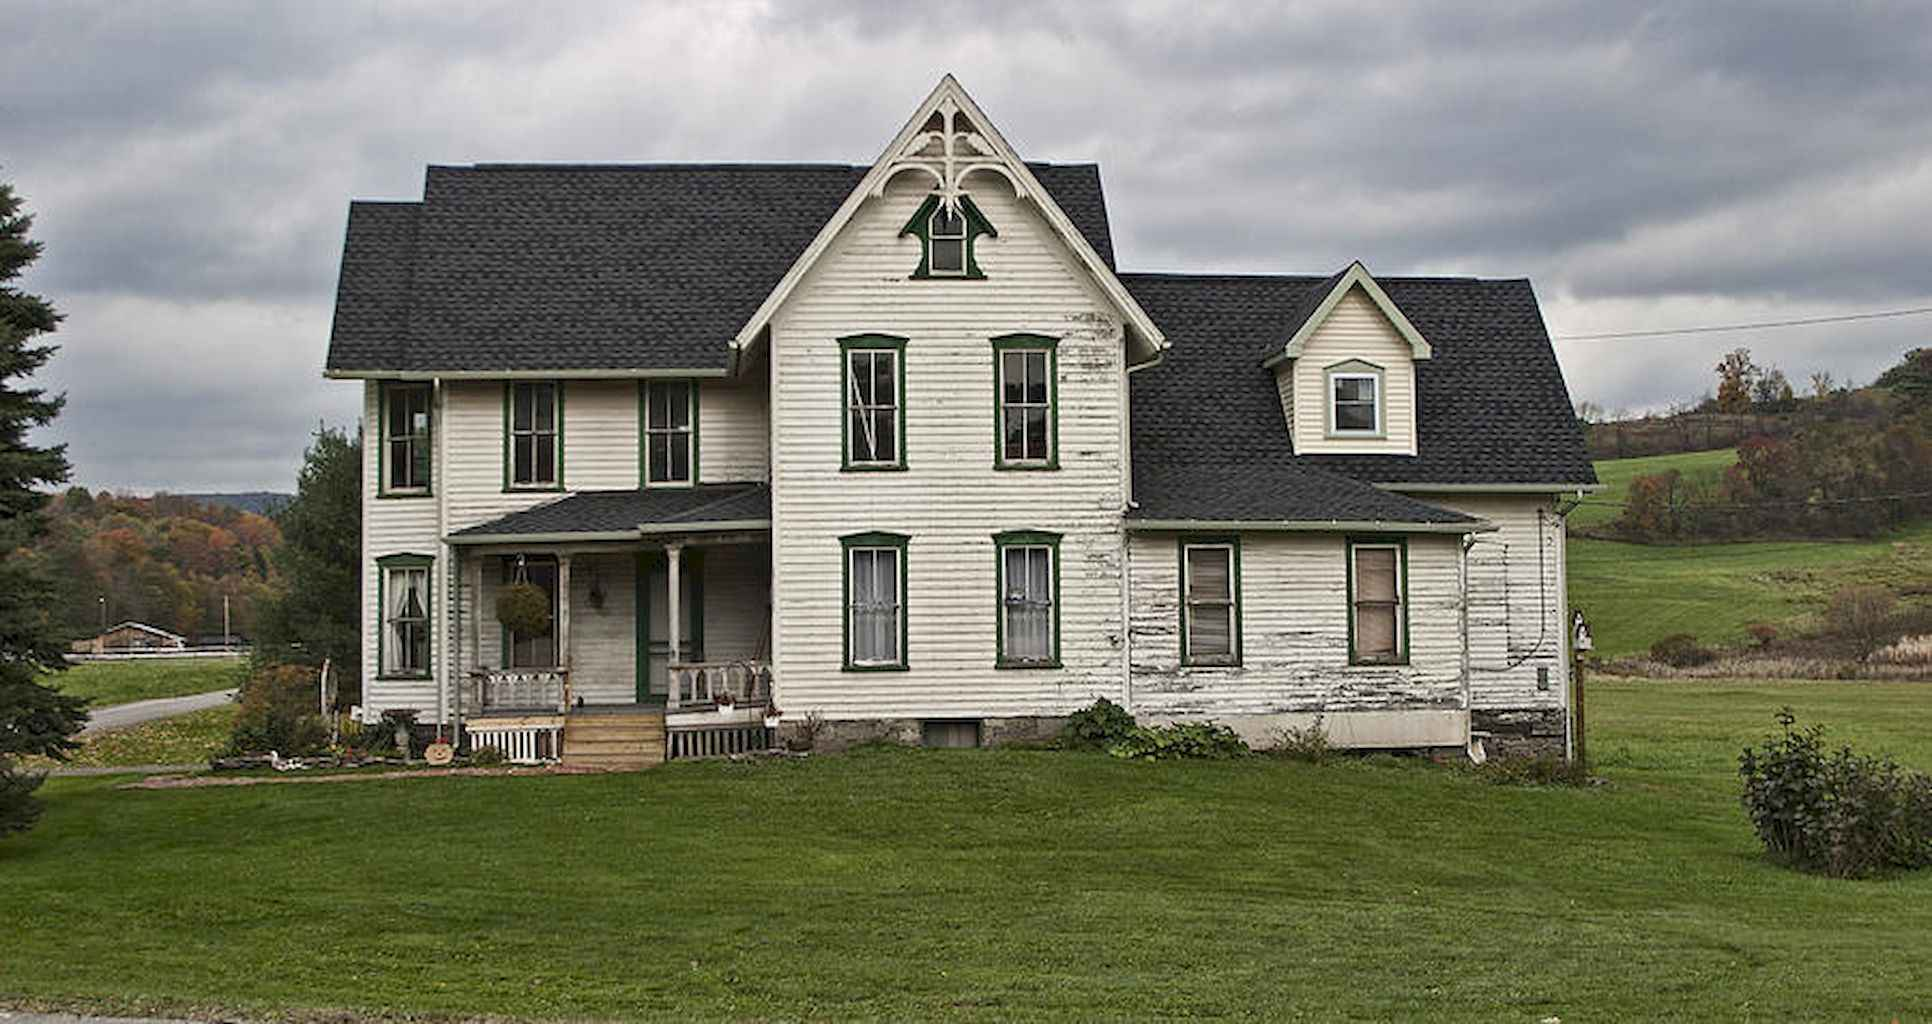 80 awesome victorian farmhouse plans design ideas (2)